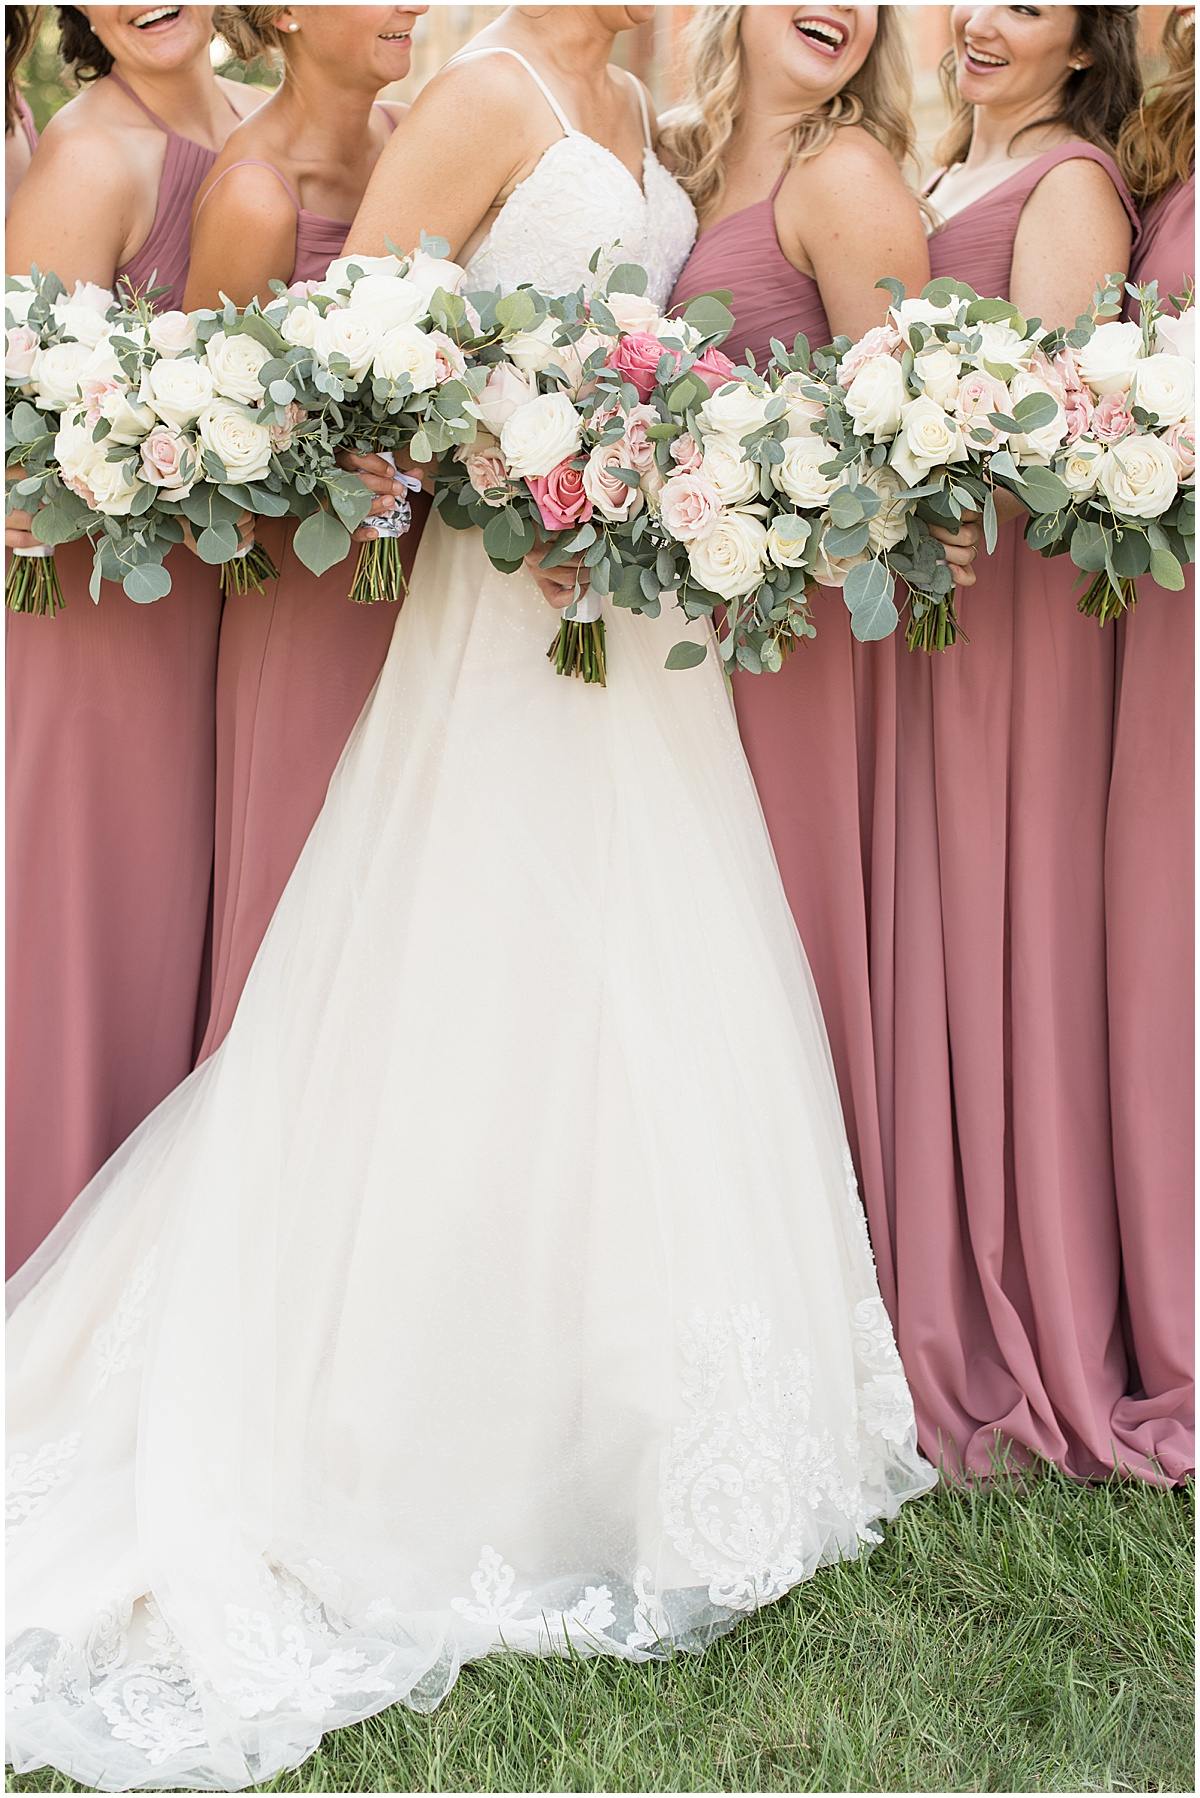 Wedding bouquets at Spohn Ballroom wedding in Goshen, Indiana